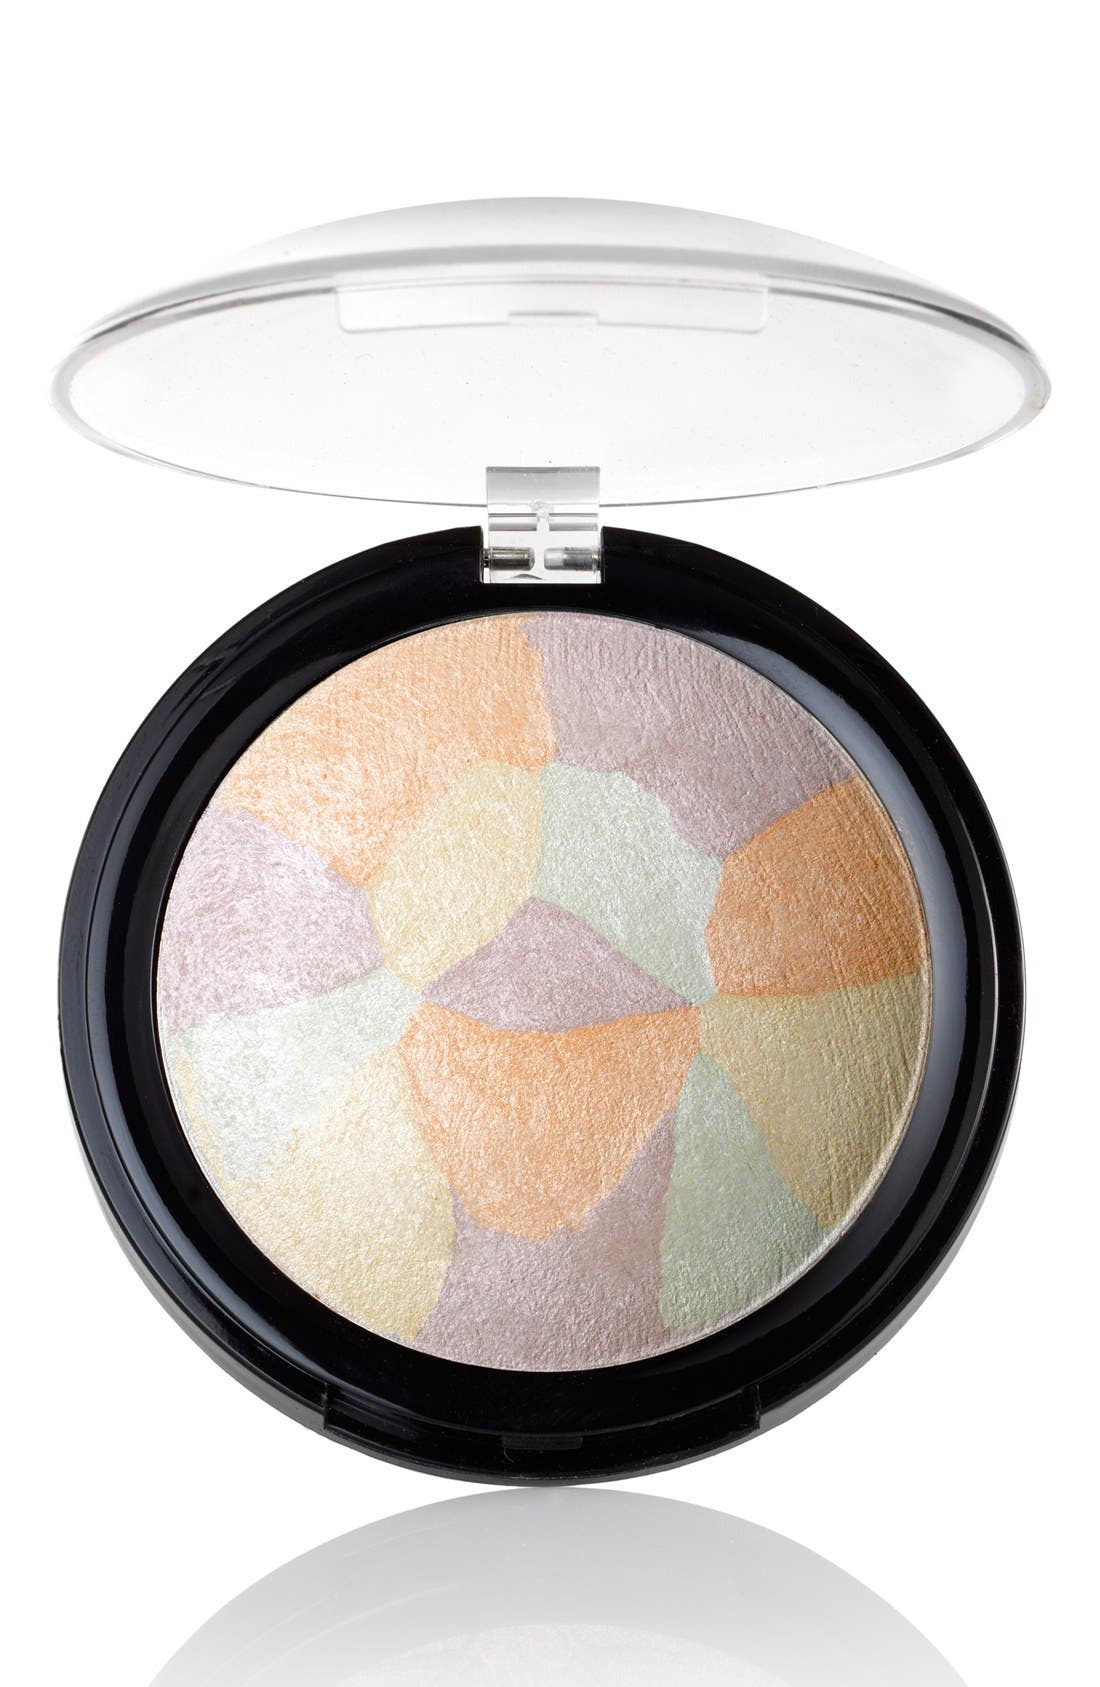 Laura Geller Beauty 'Filter Finish' Setting Powder